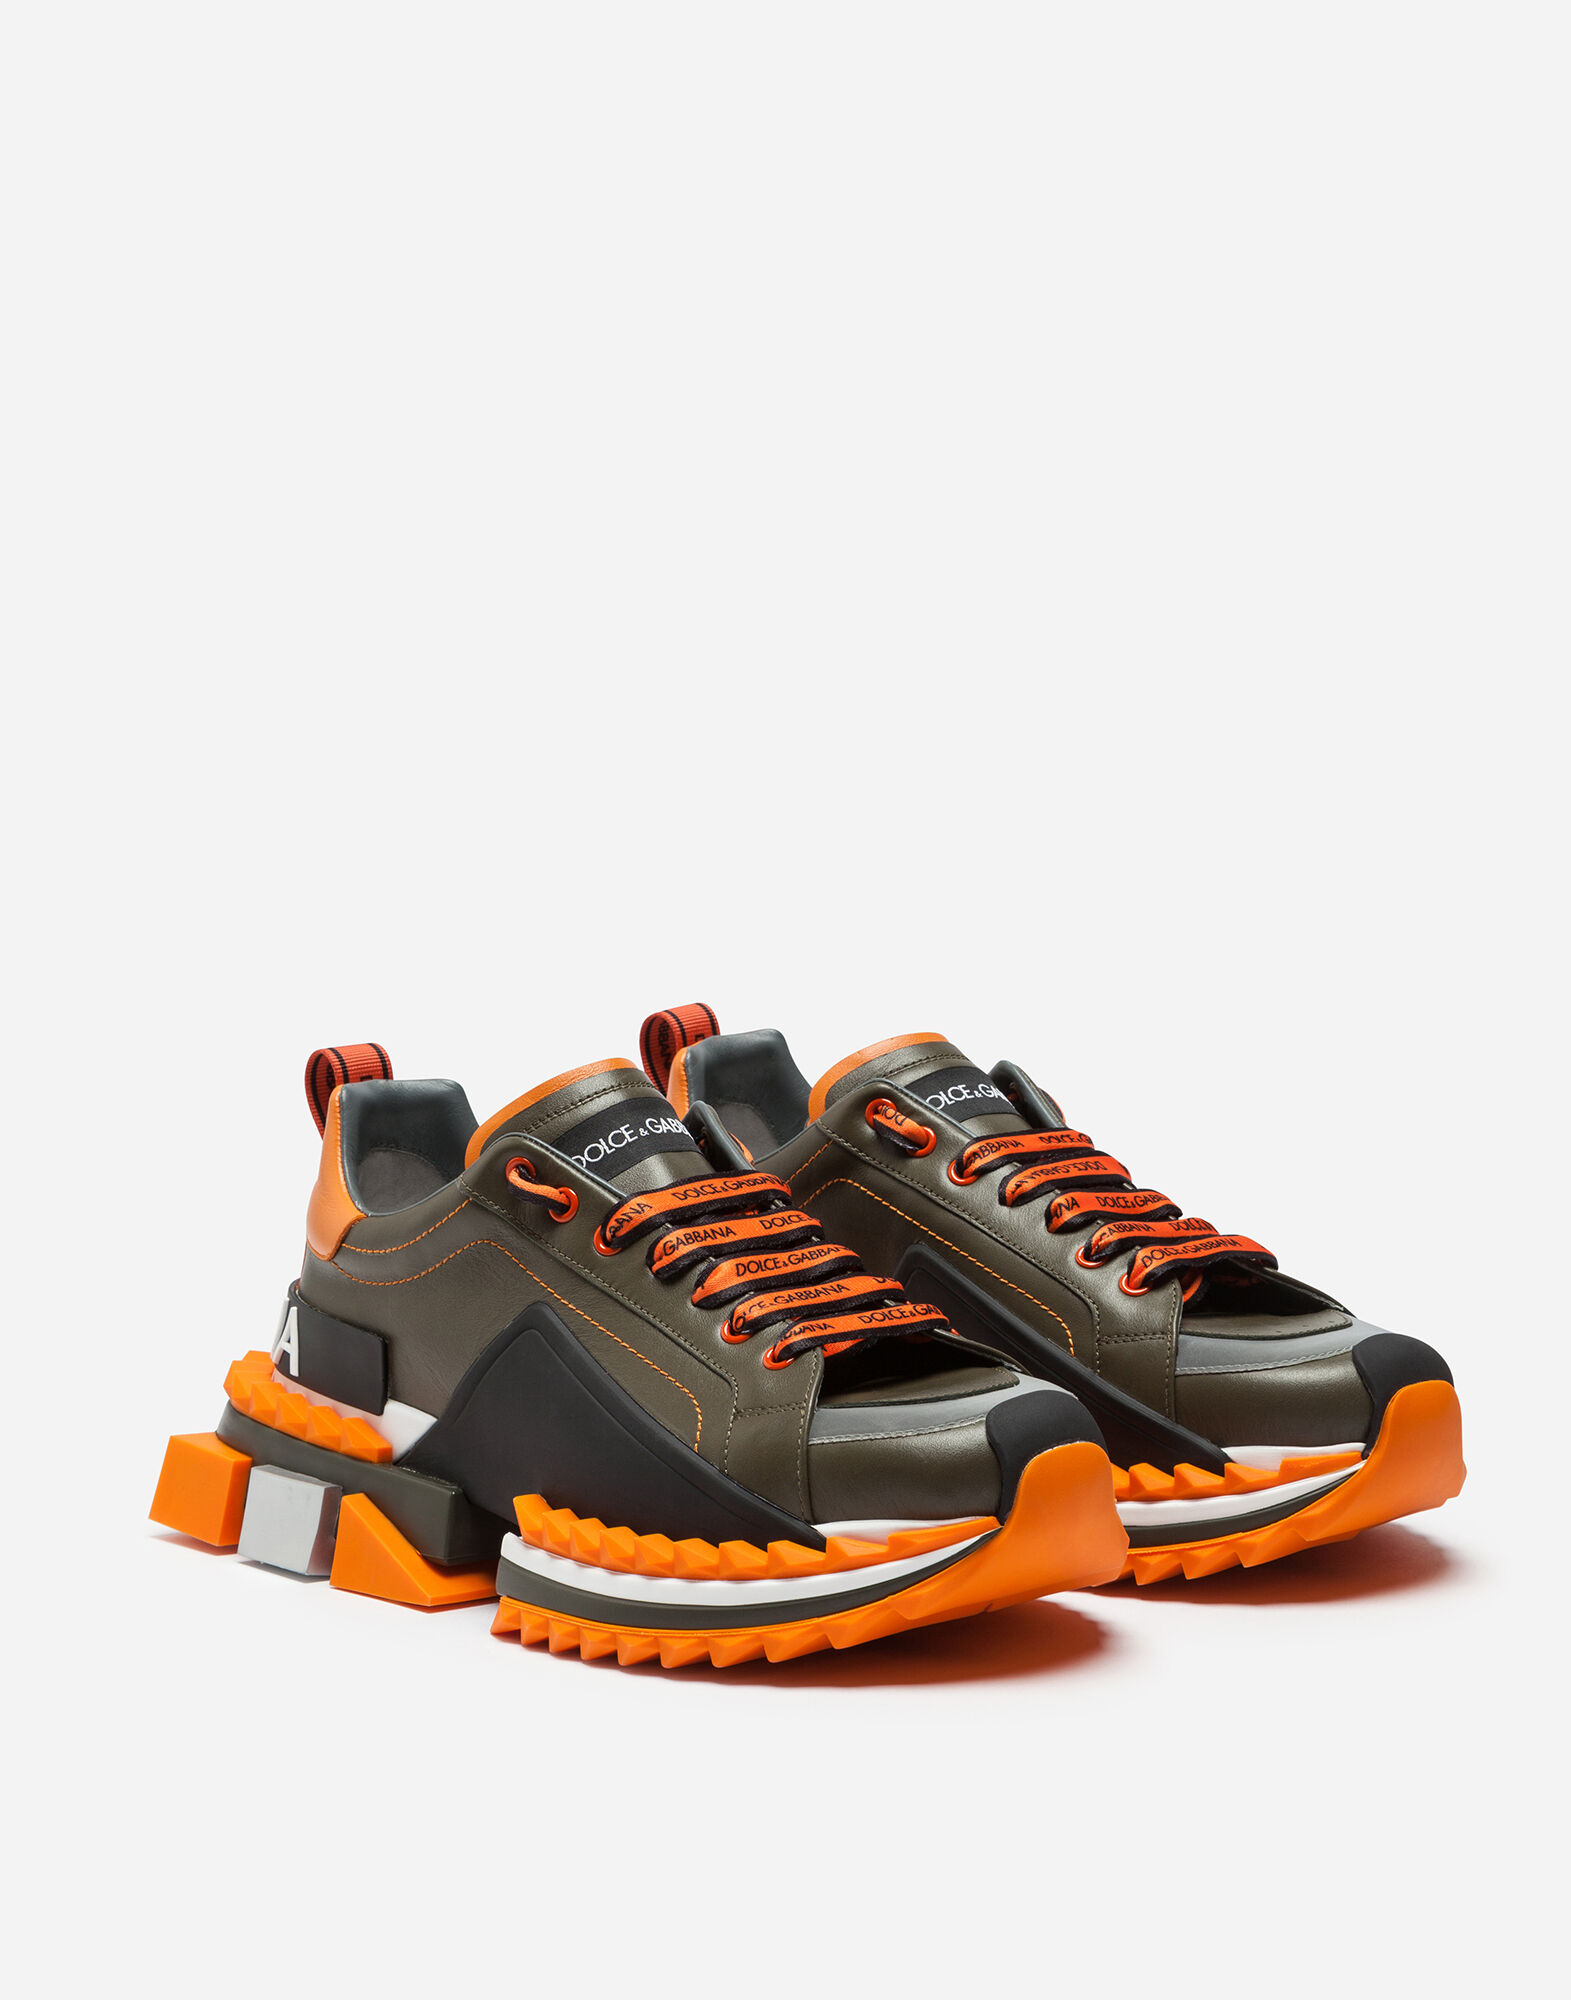 Dolce Amp Gabbana Multicolor Super King Sneakers In 8r538